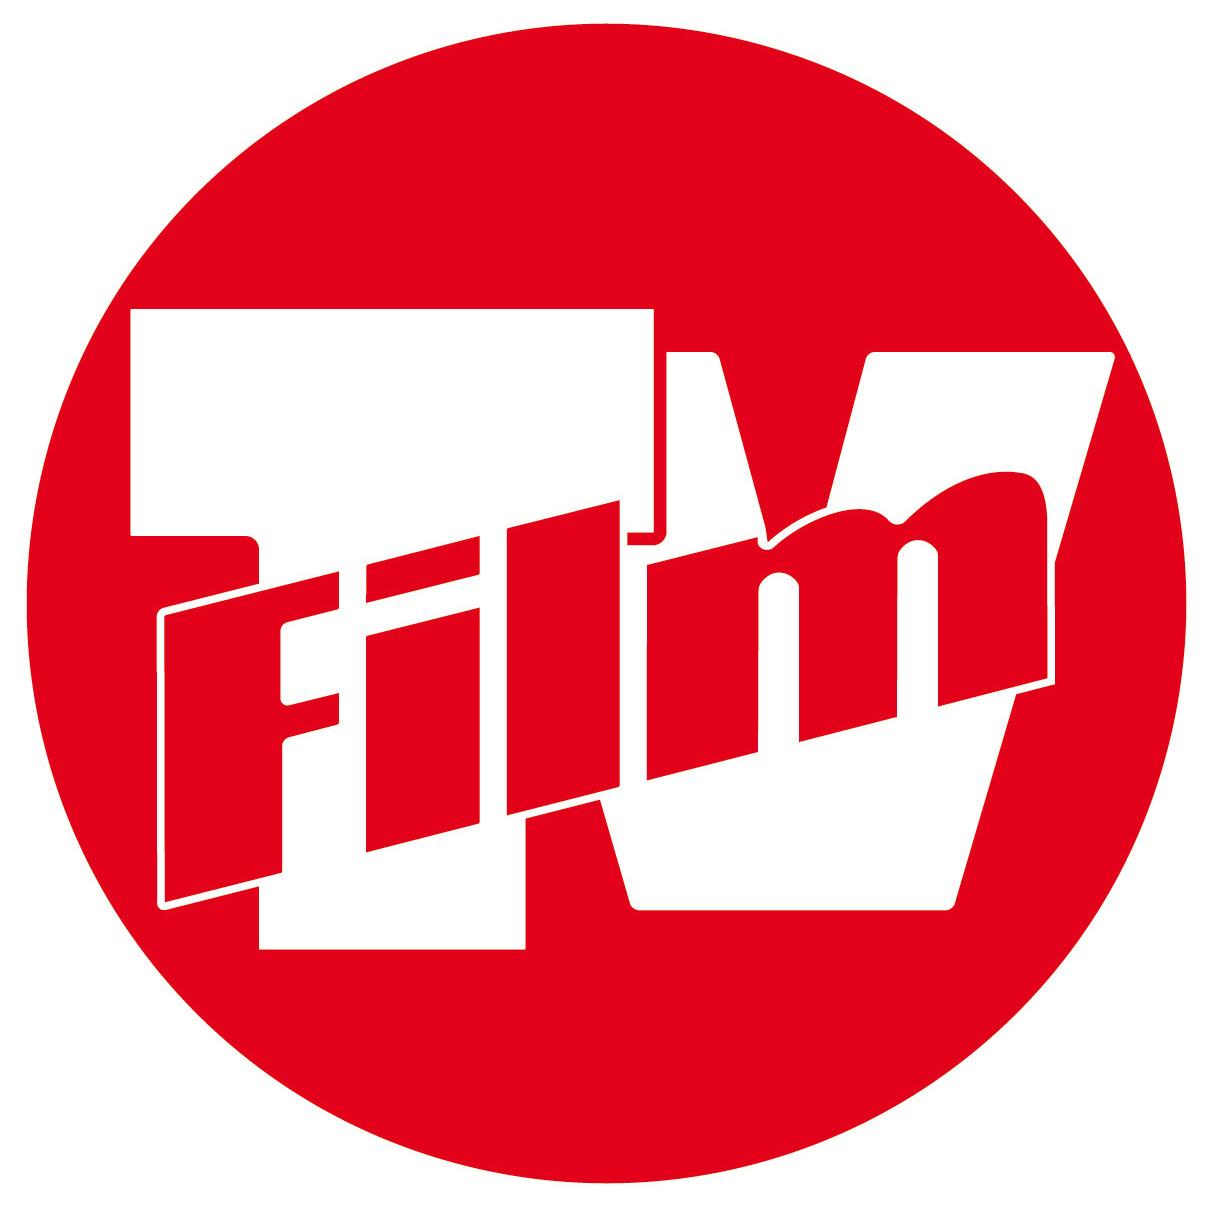 logo flat crop rosso.jpg